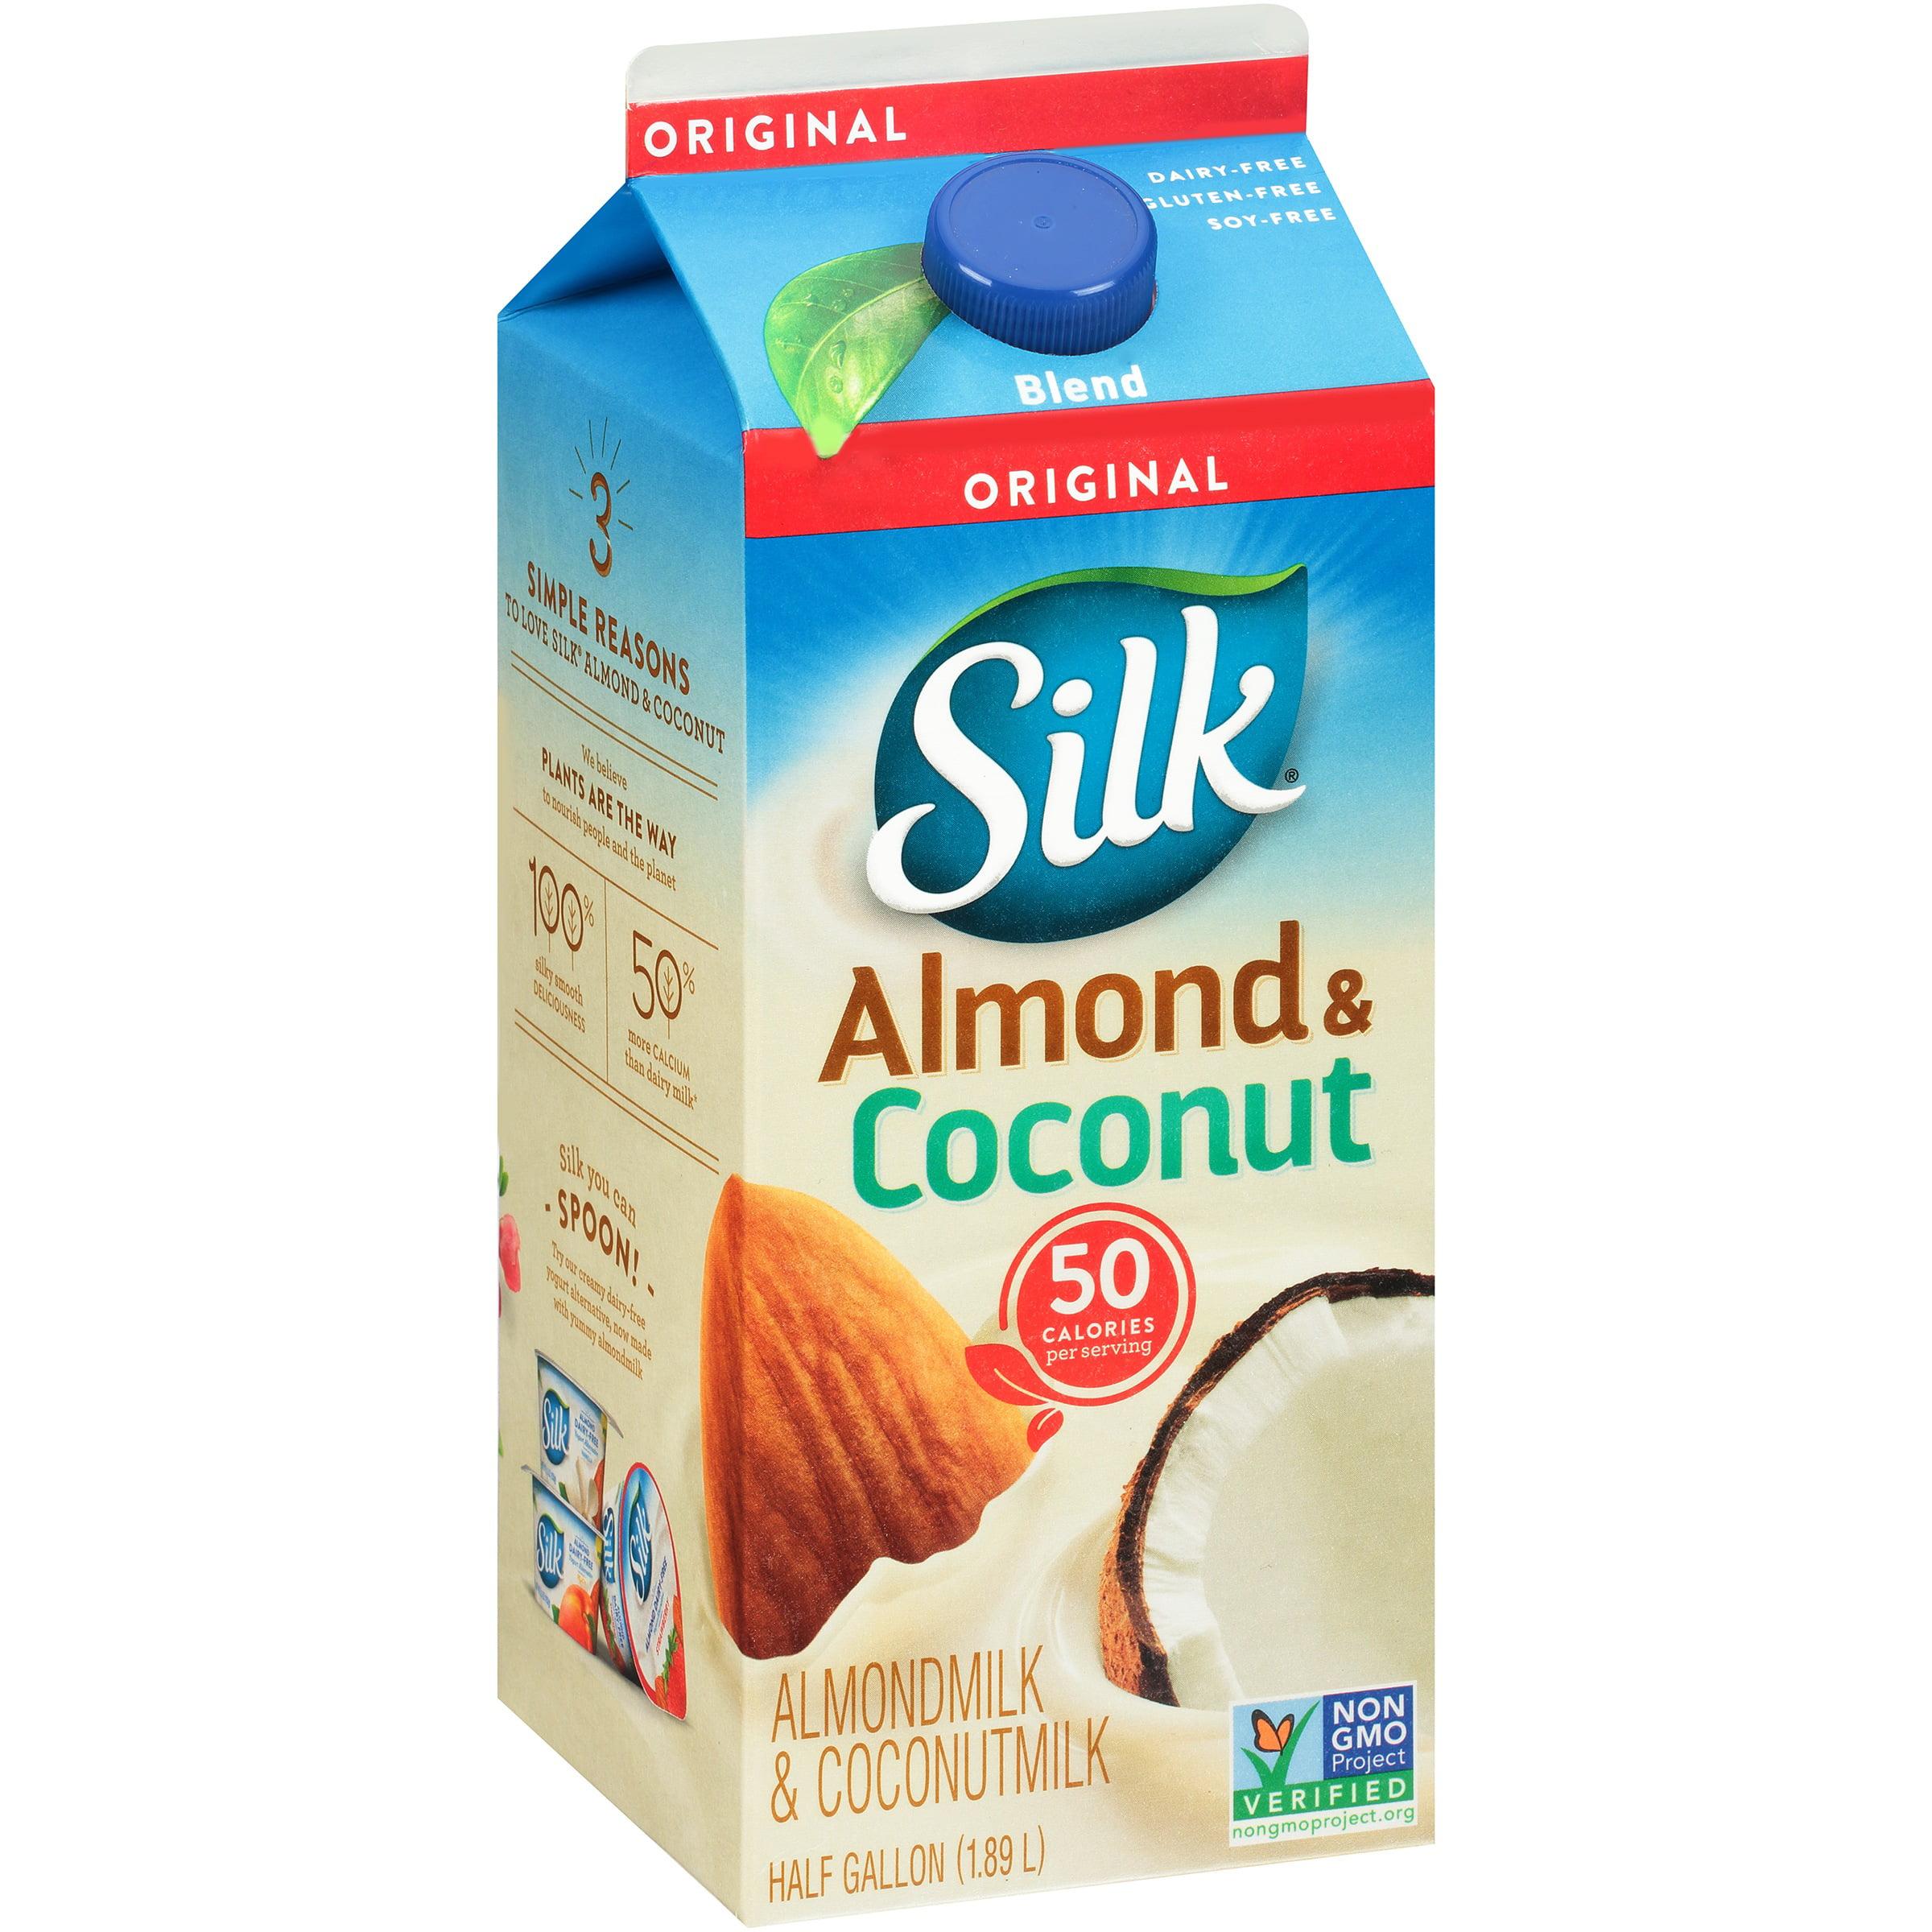 Silk Original AlmondCoconut Blend, 0.5 gal - Walmart.com